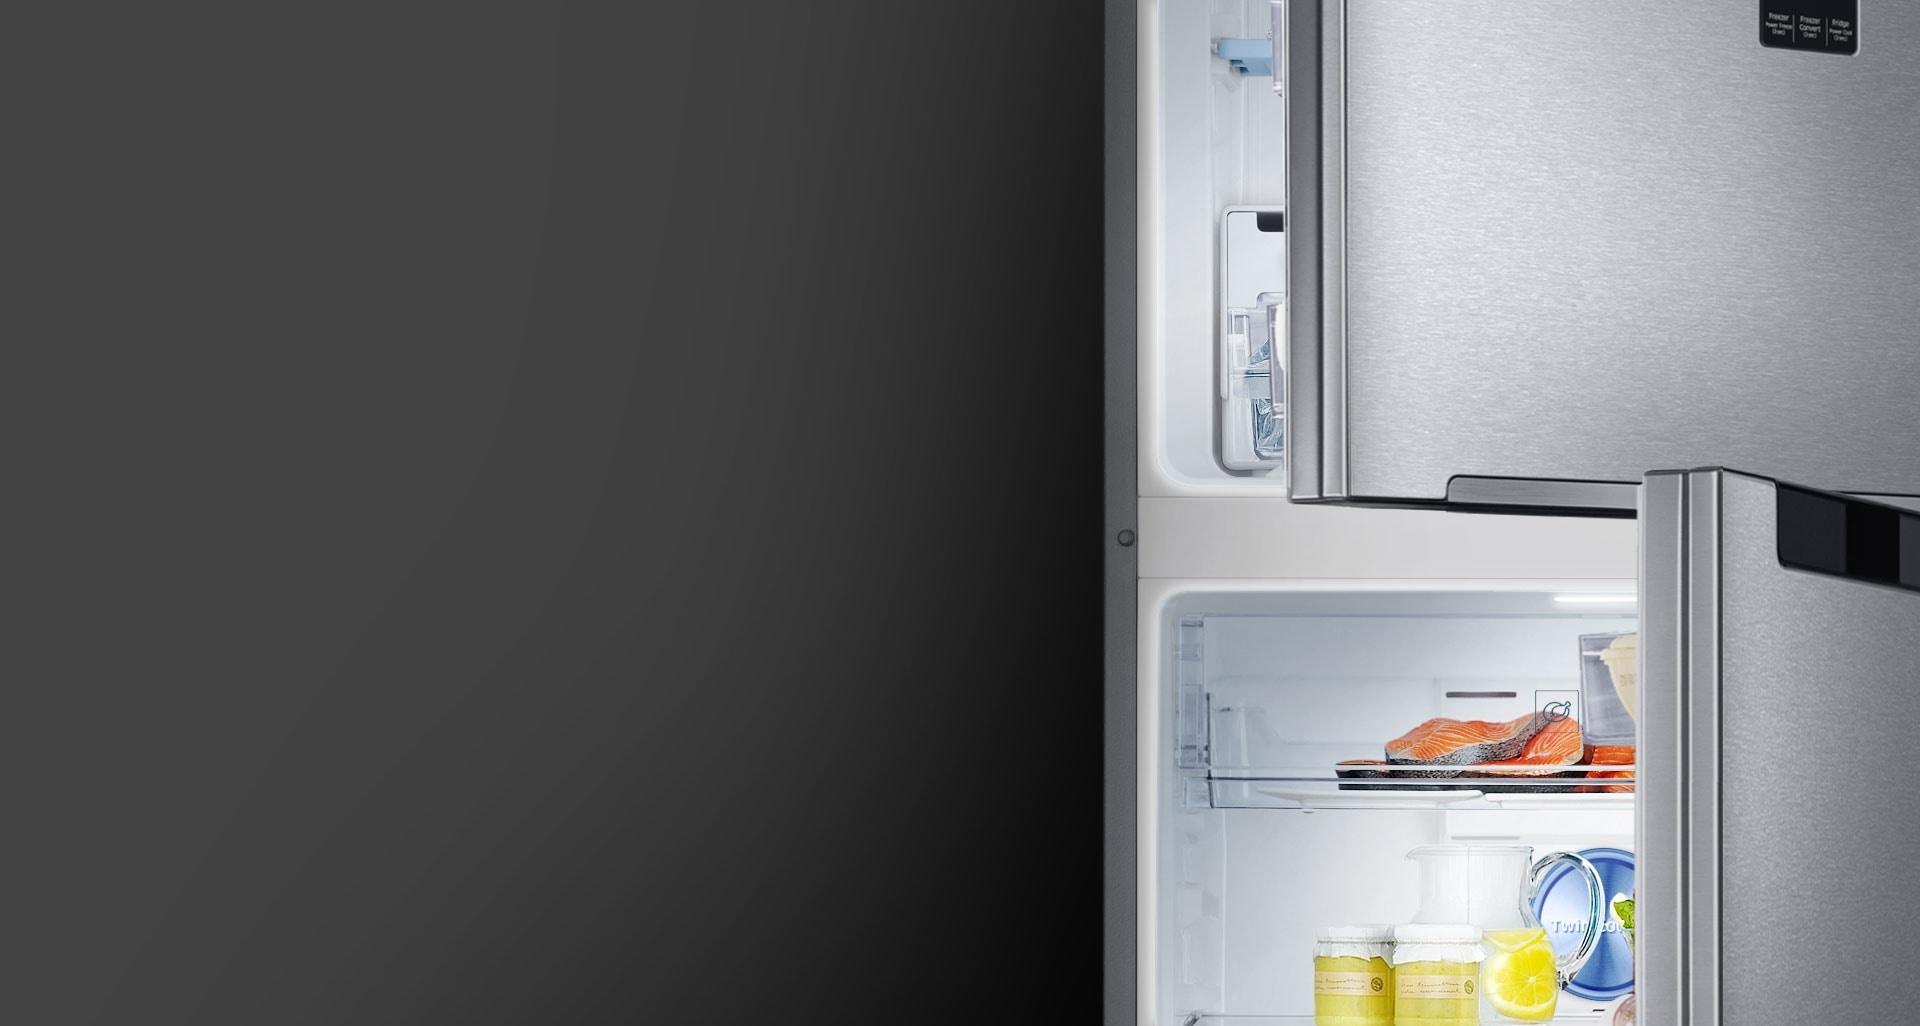 Samsung 2 door Fridge with High efficiency LED lighting